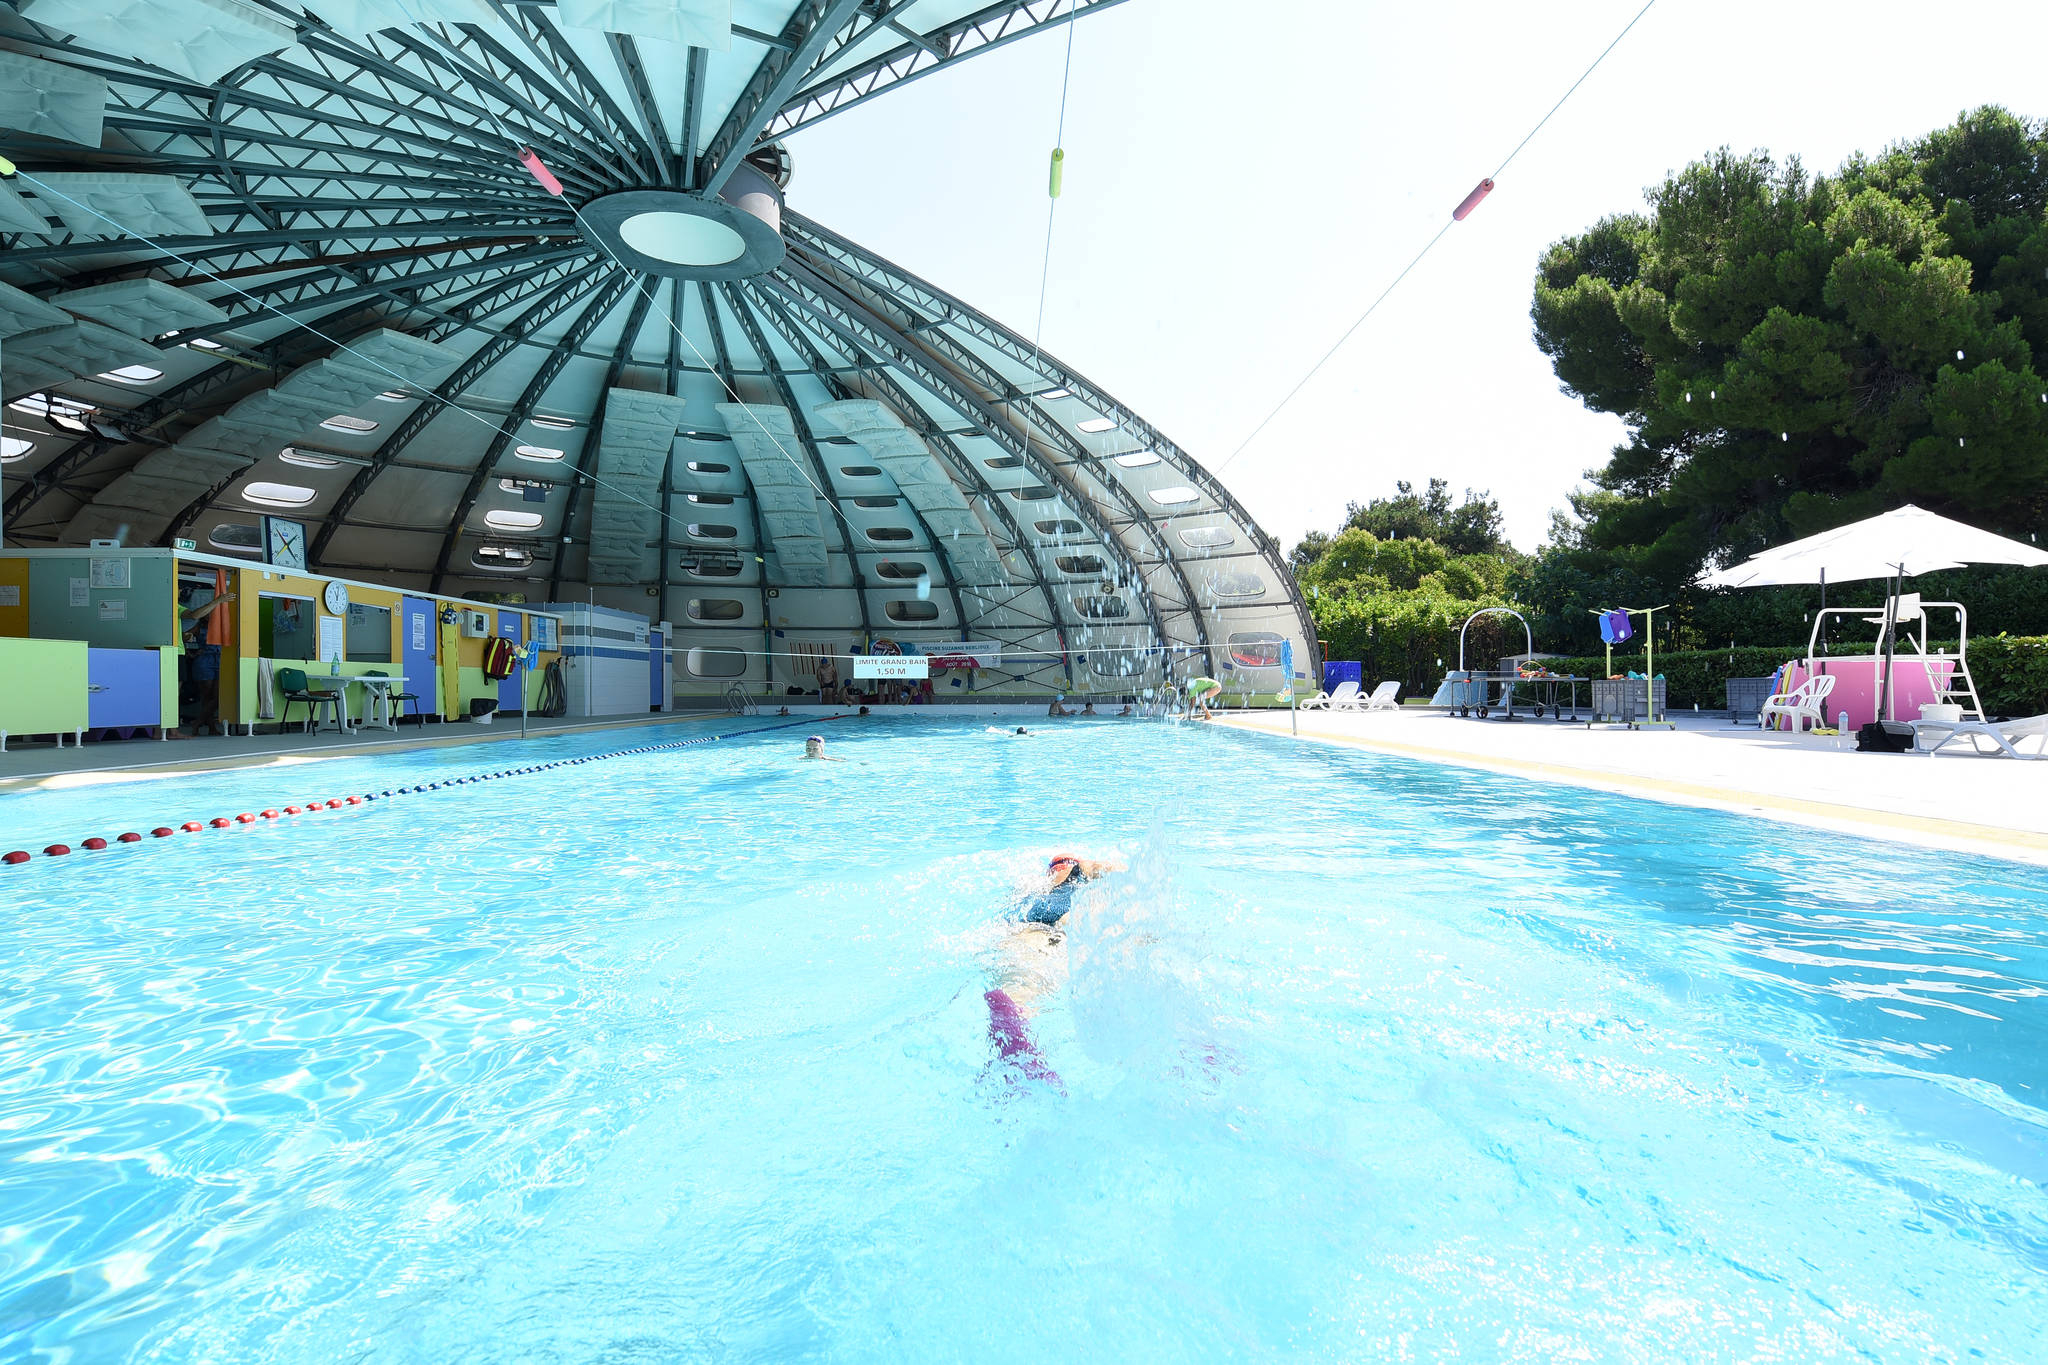 Piscine Suzanne Berlioux (La Rauze), Swimming-Pool ... avec Piscine Originale